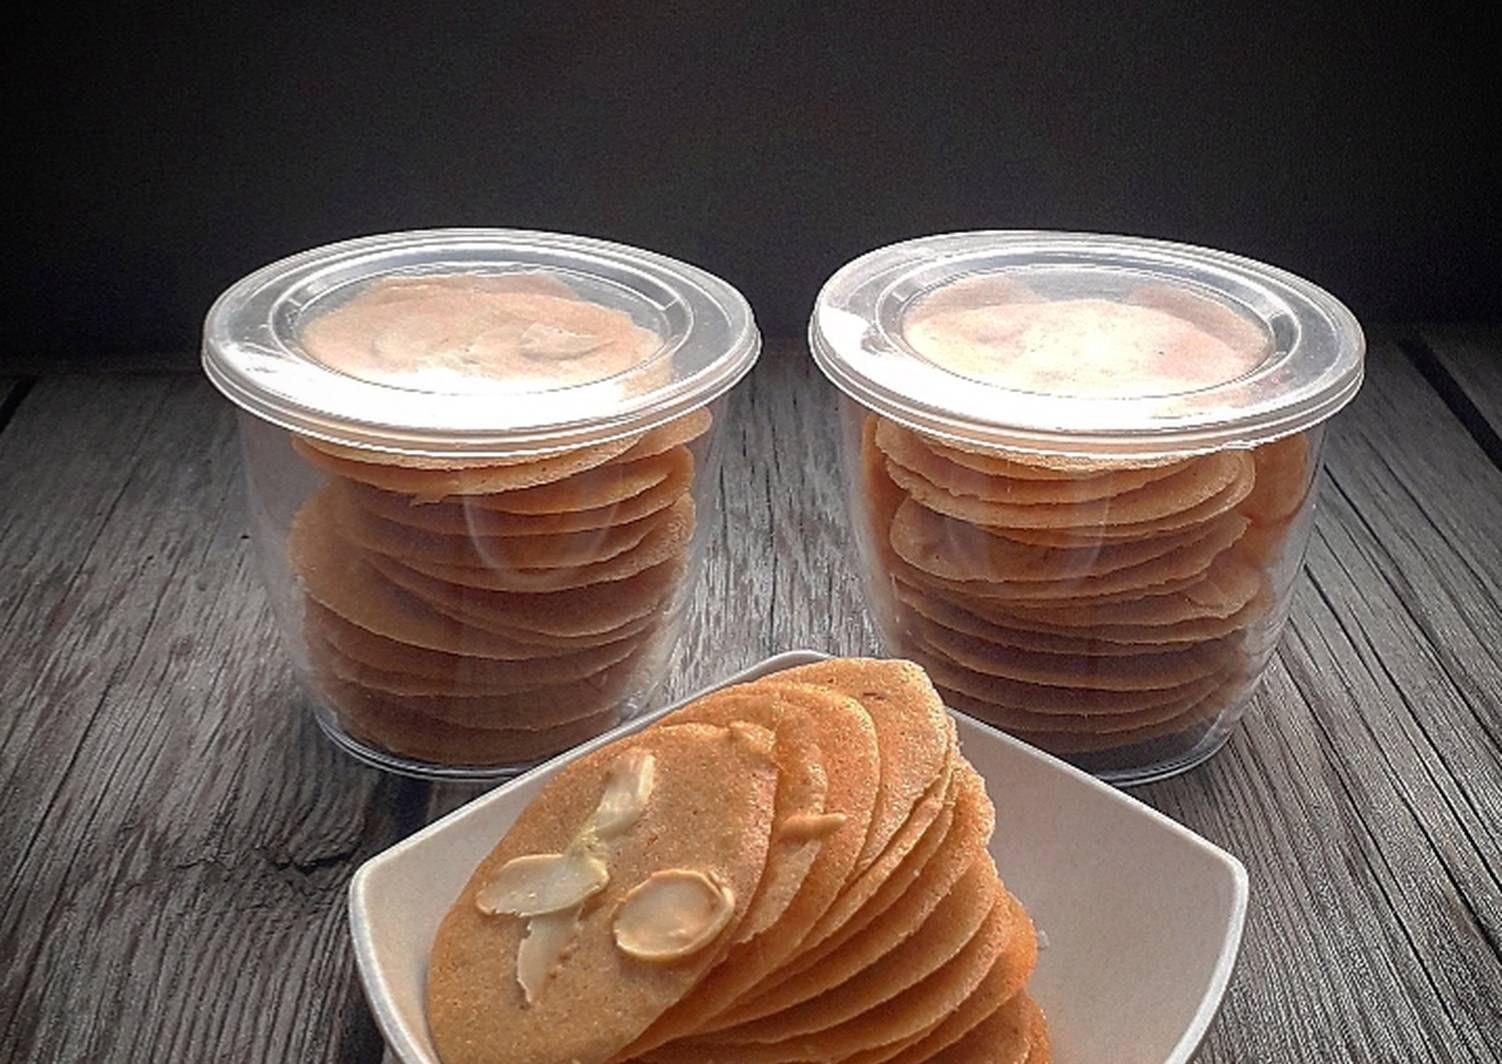 Resep Almond Crispy Oleh Endah Palupi Resep Makanan Resep Kue Kering